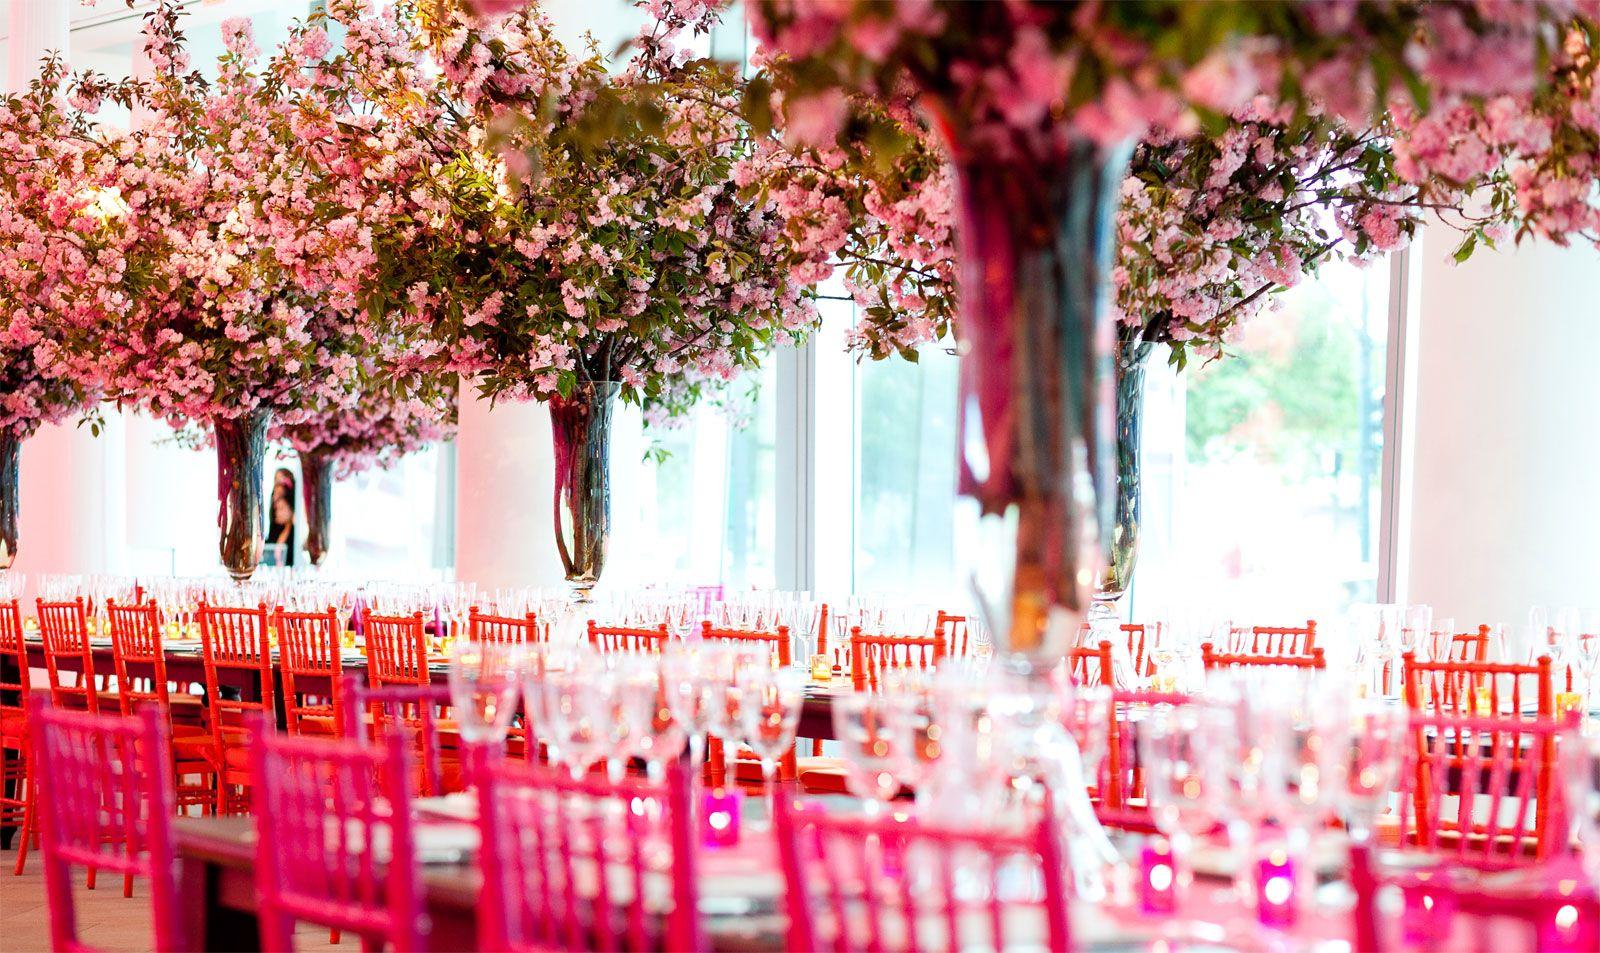 pretty in pink // FRANK ALEXANDER NYC #weddings #decor #centerpiece #pinkwedding #design #nyc #weddingdecor #prettyinpink